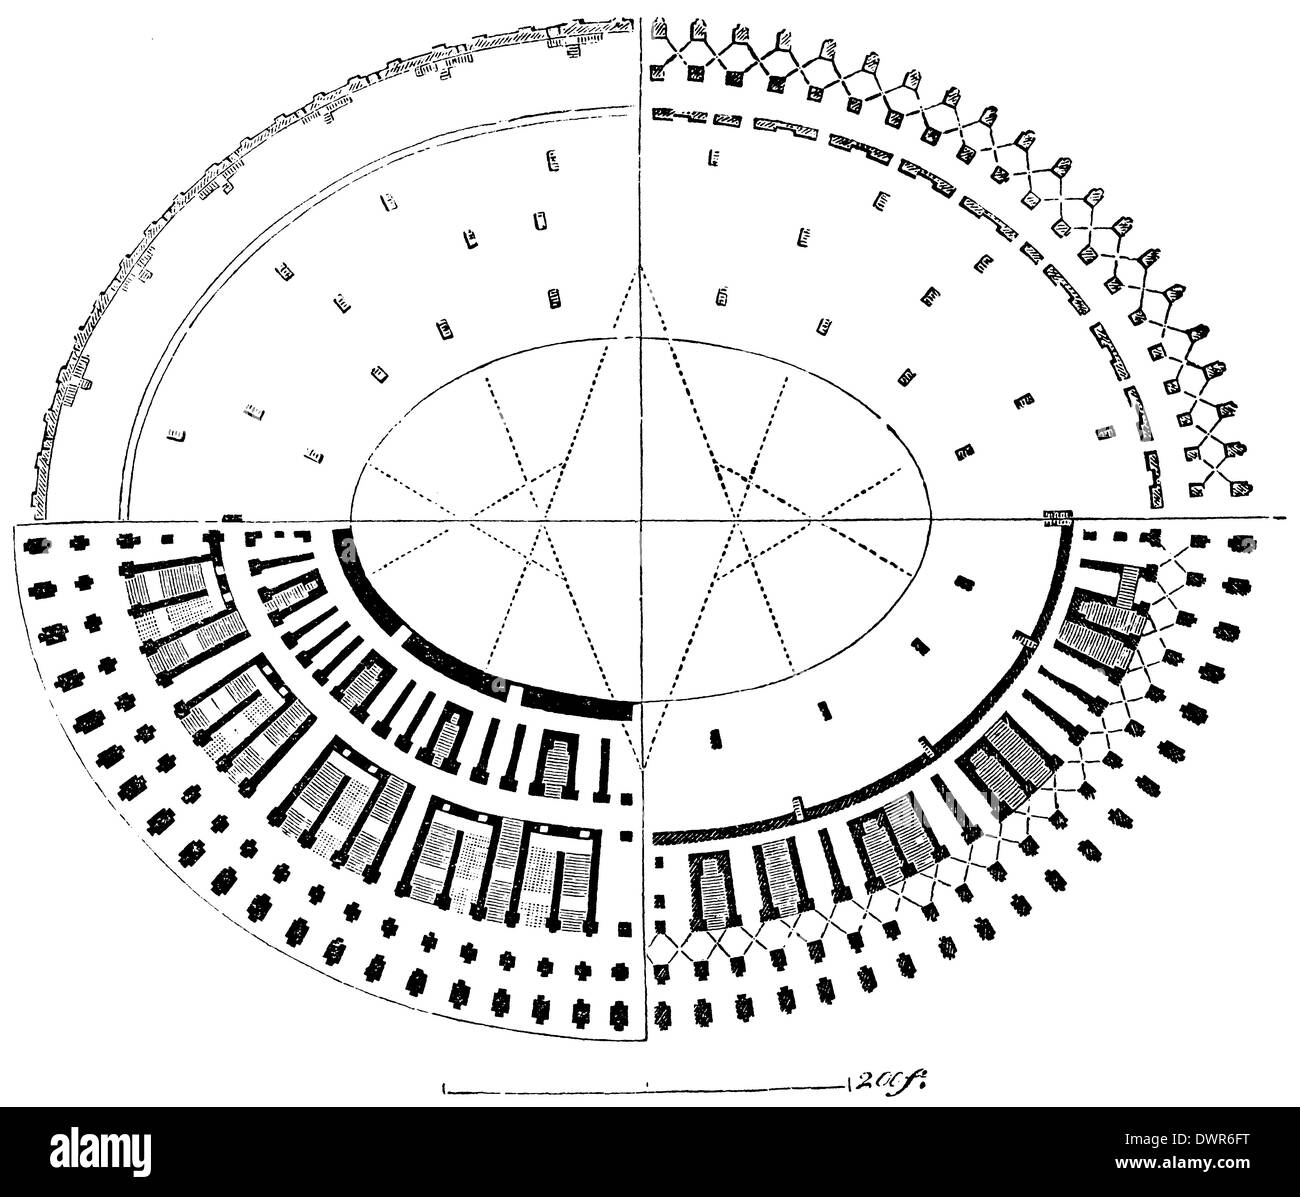 Colosseum Plan Stock Photo Alamy